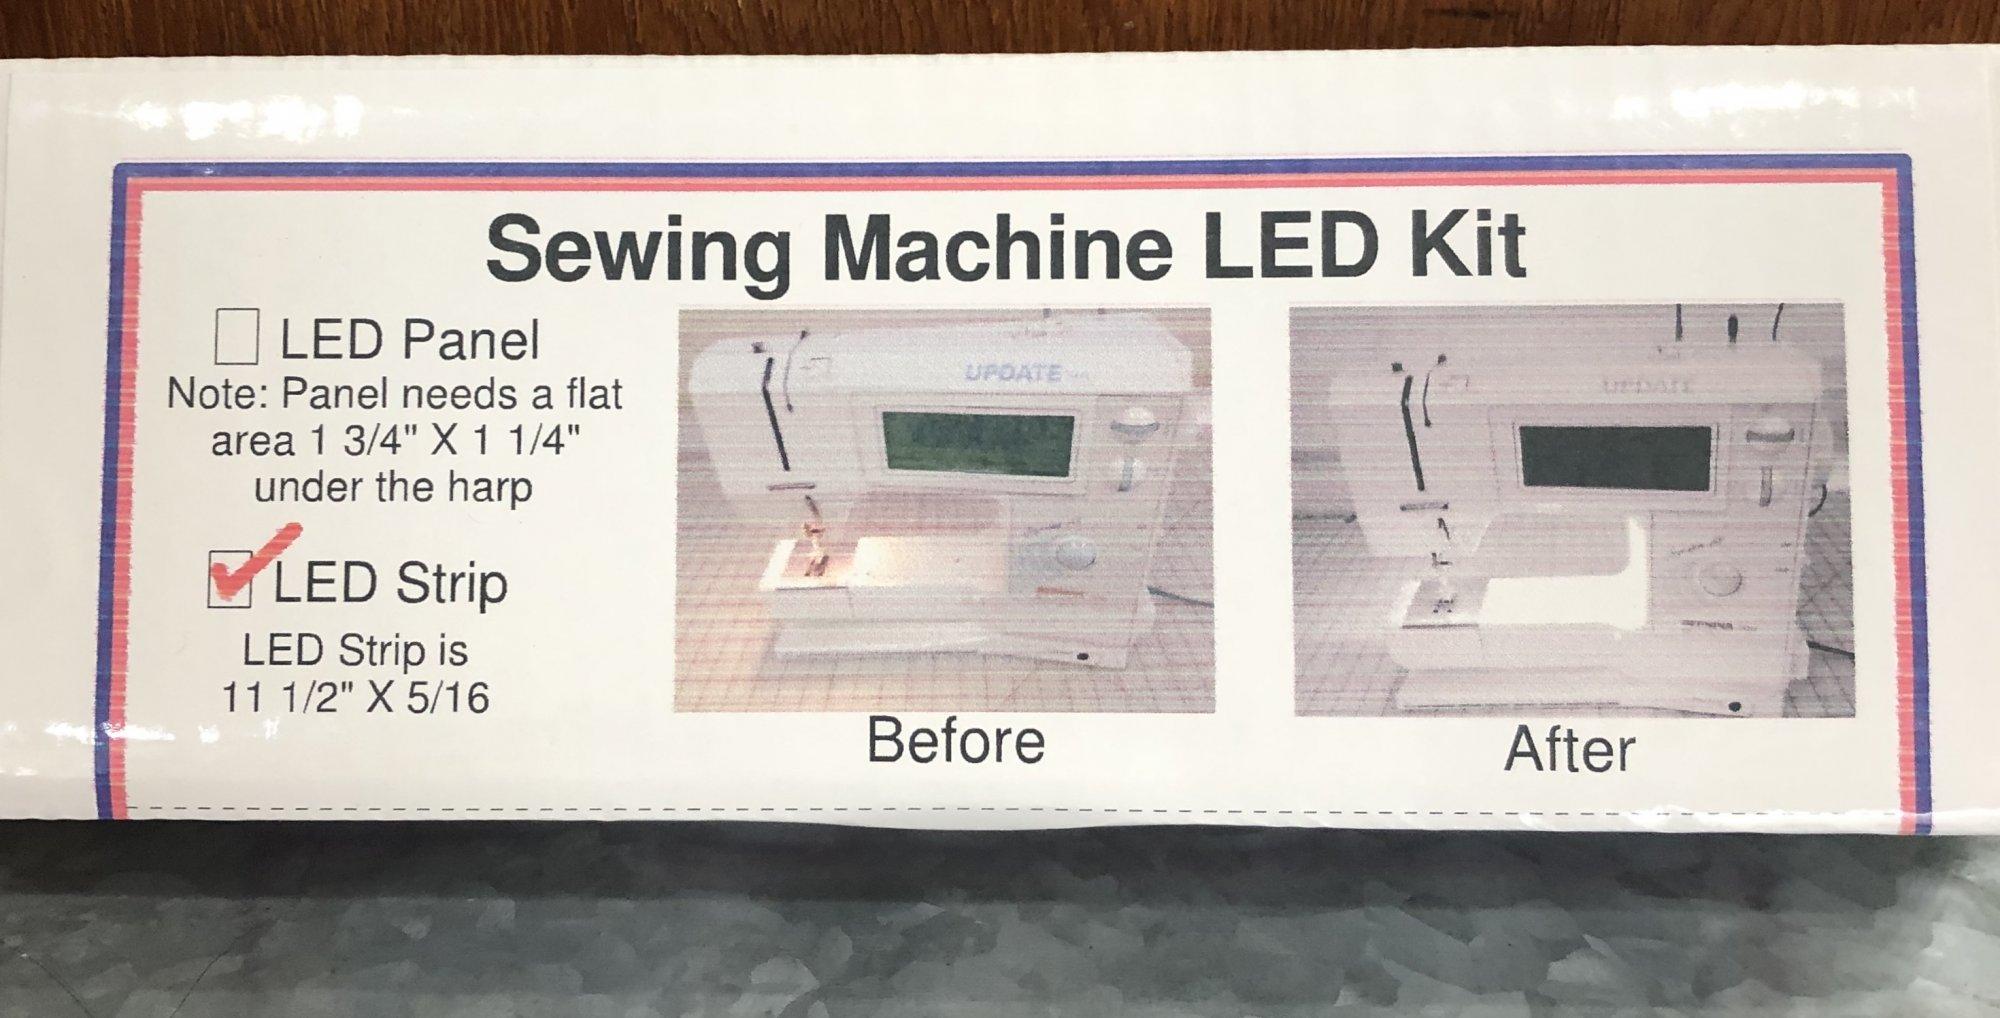 Sewing Machine LED Kit (LED Strip)